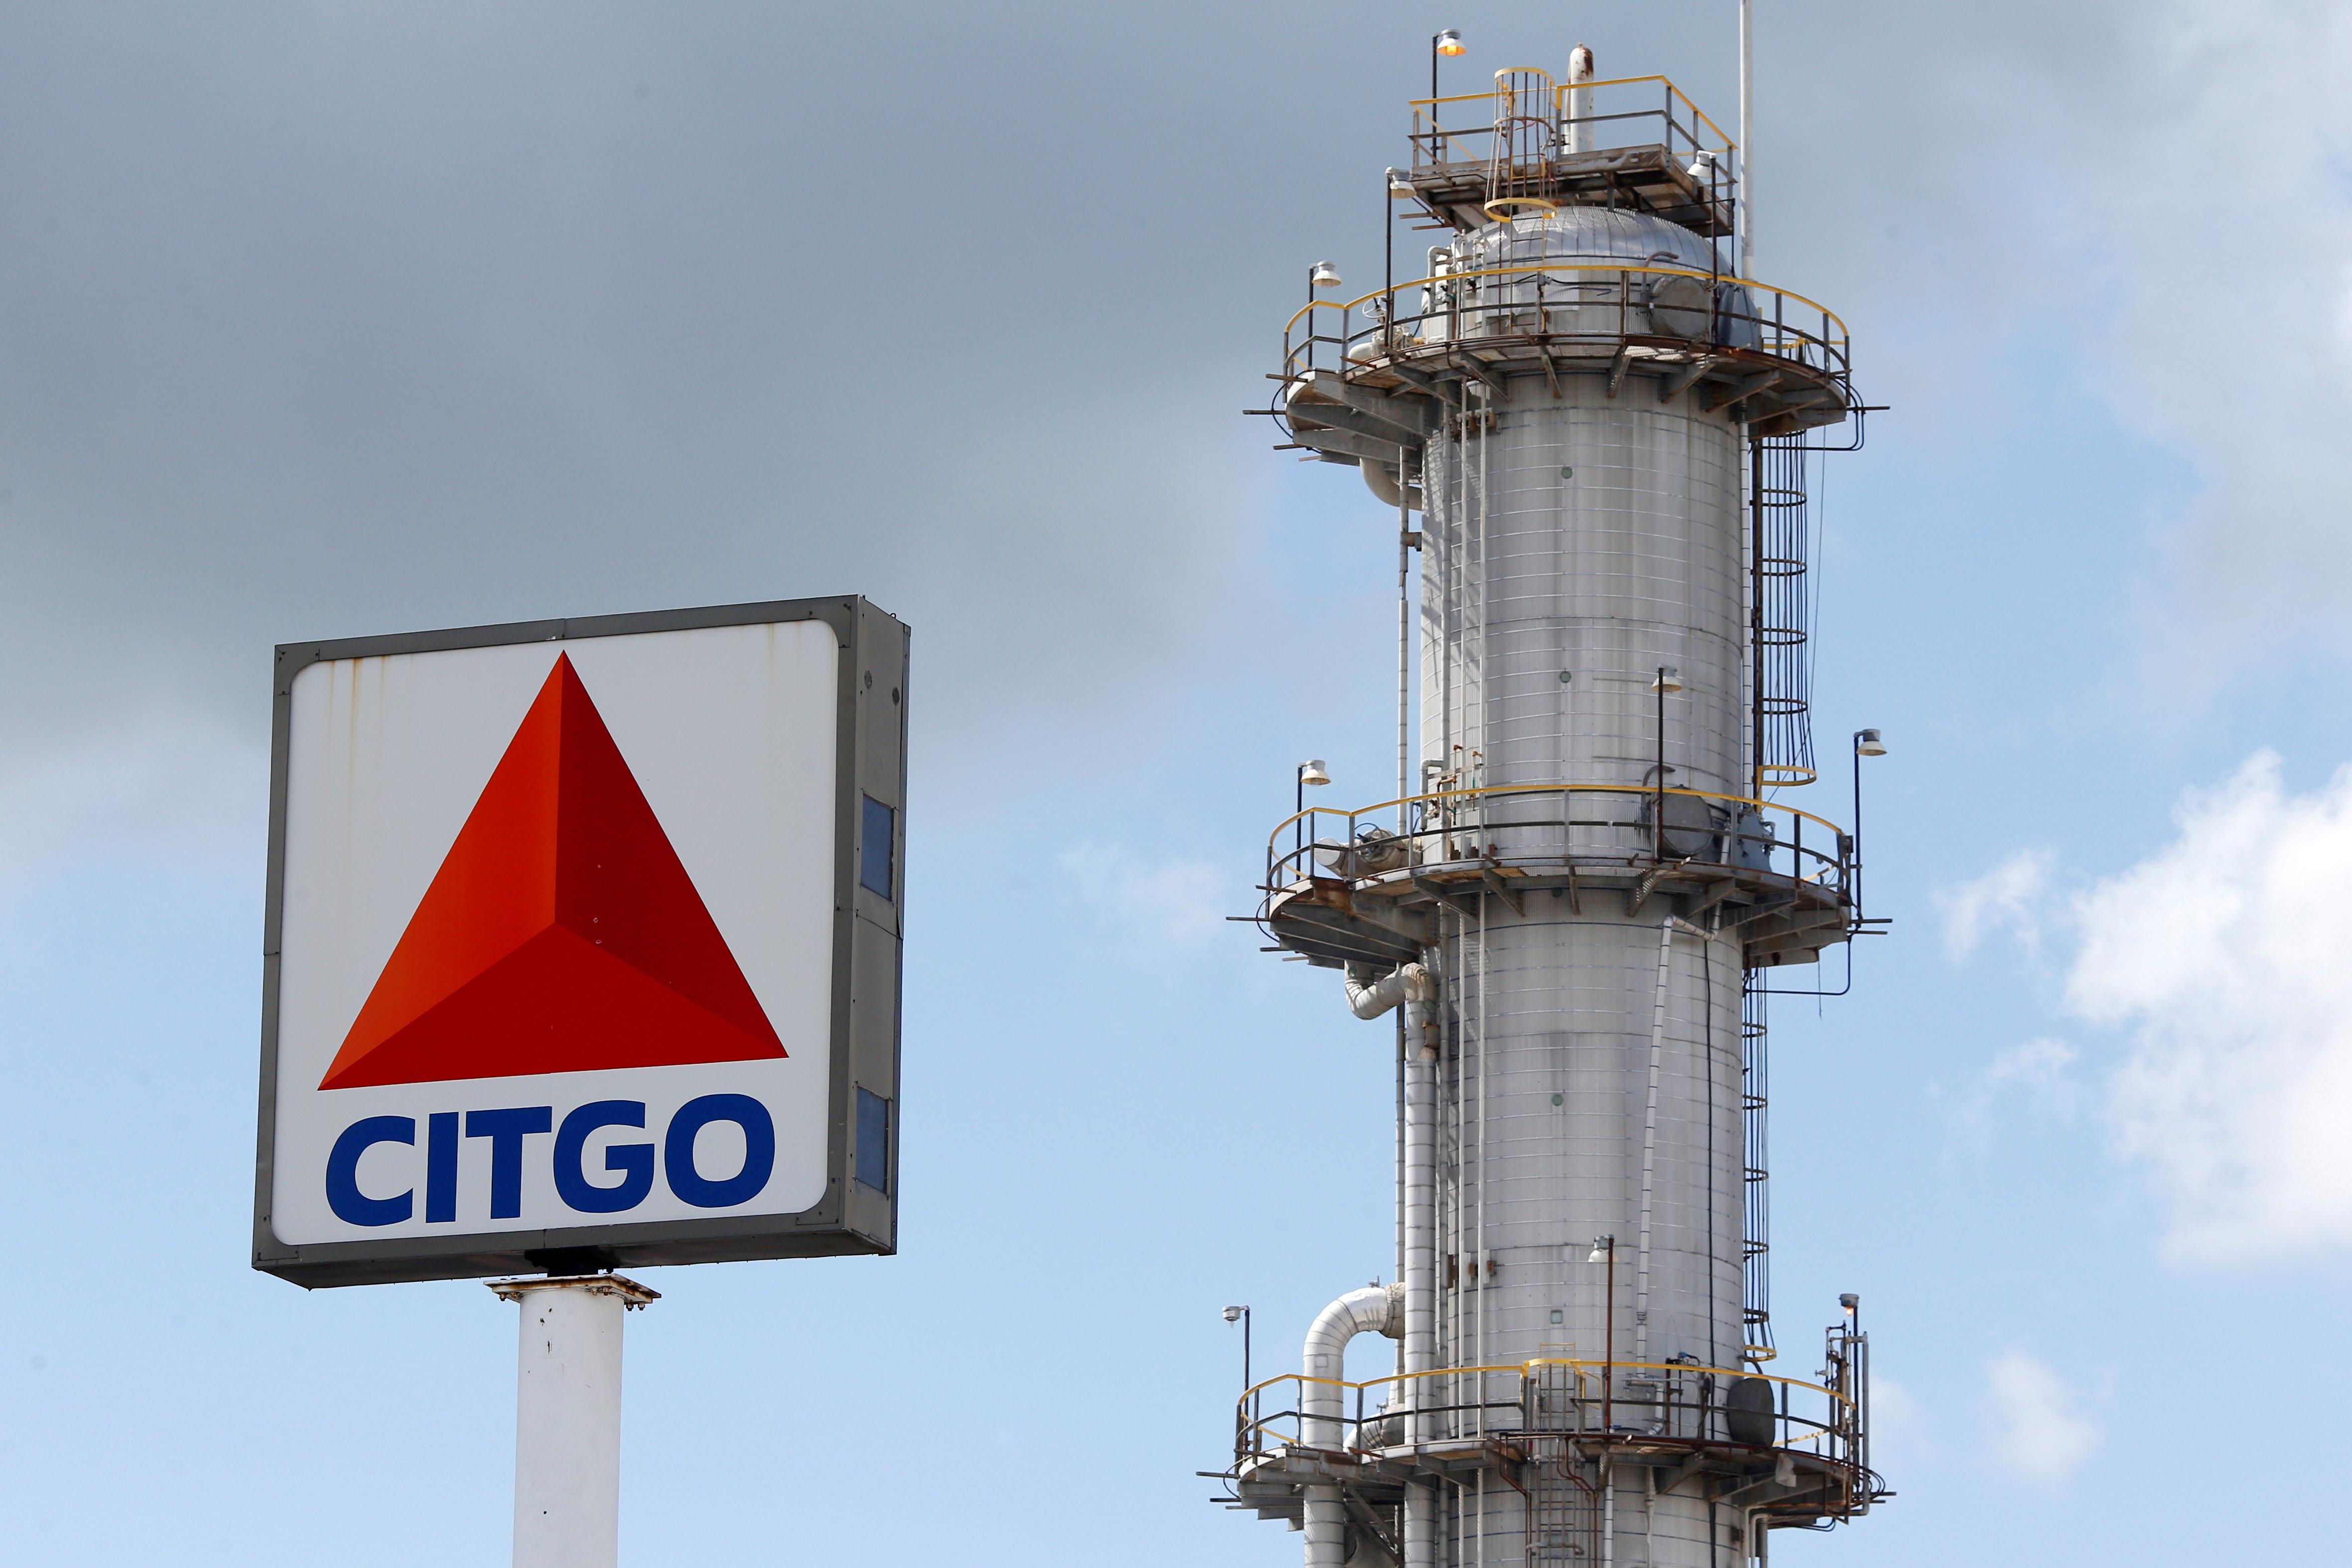 Citgo Petroleum bolsters legal defenses with ex-BP lawyer